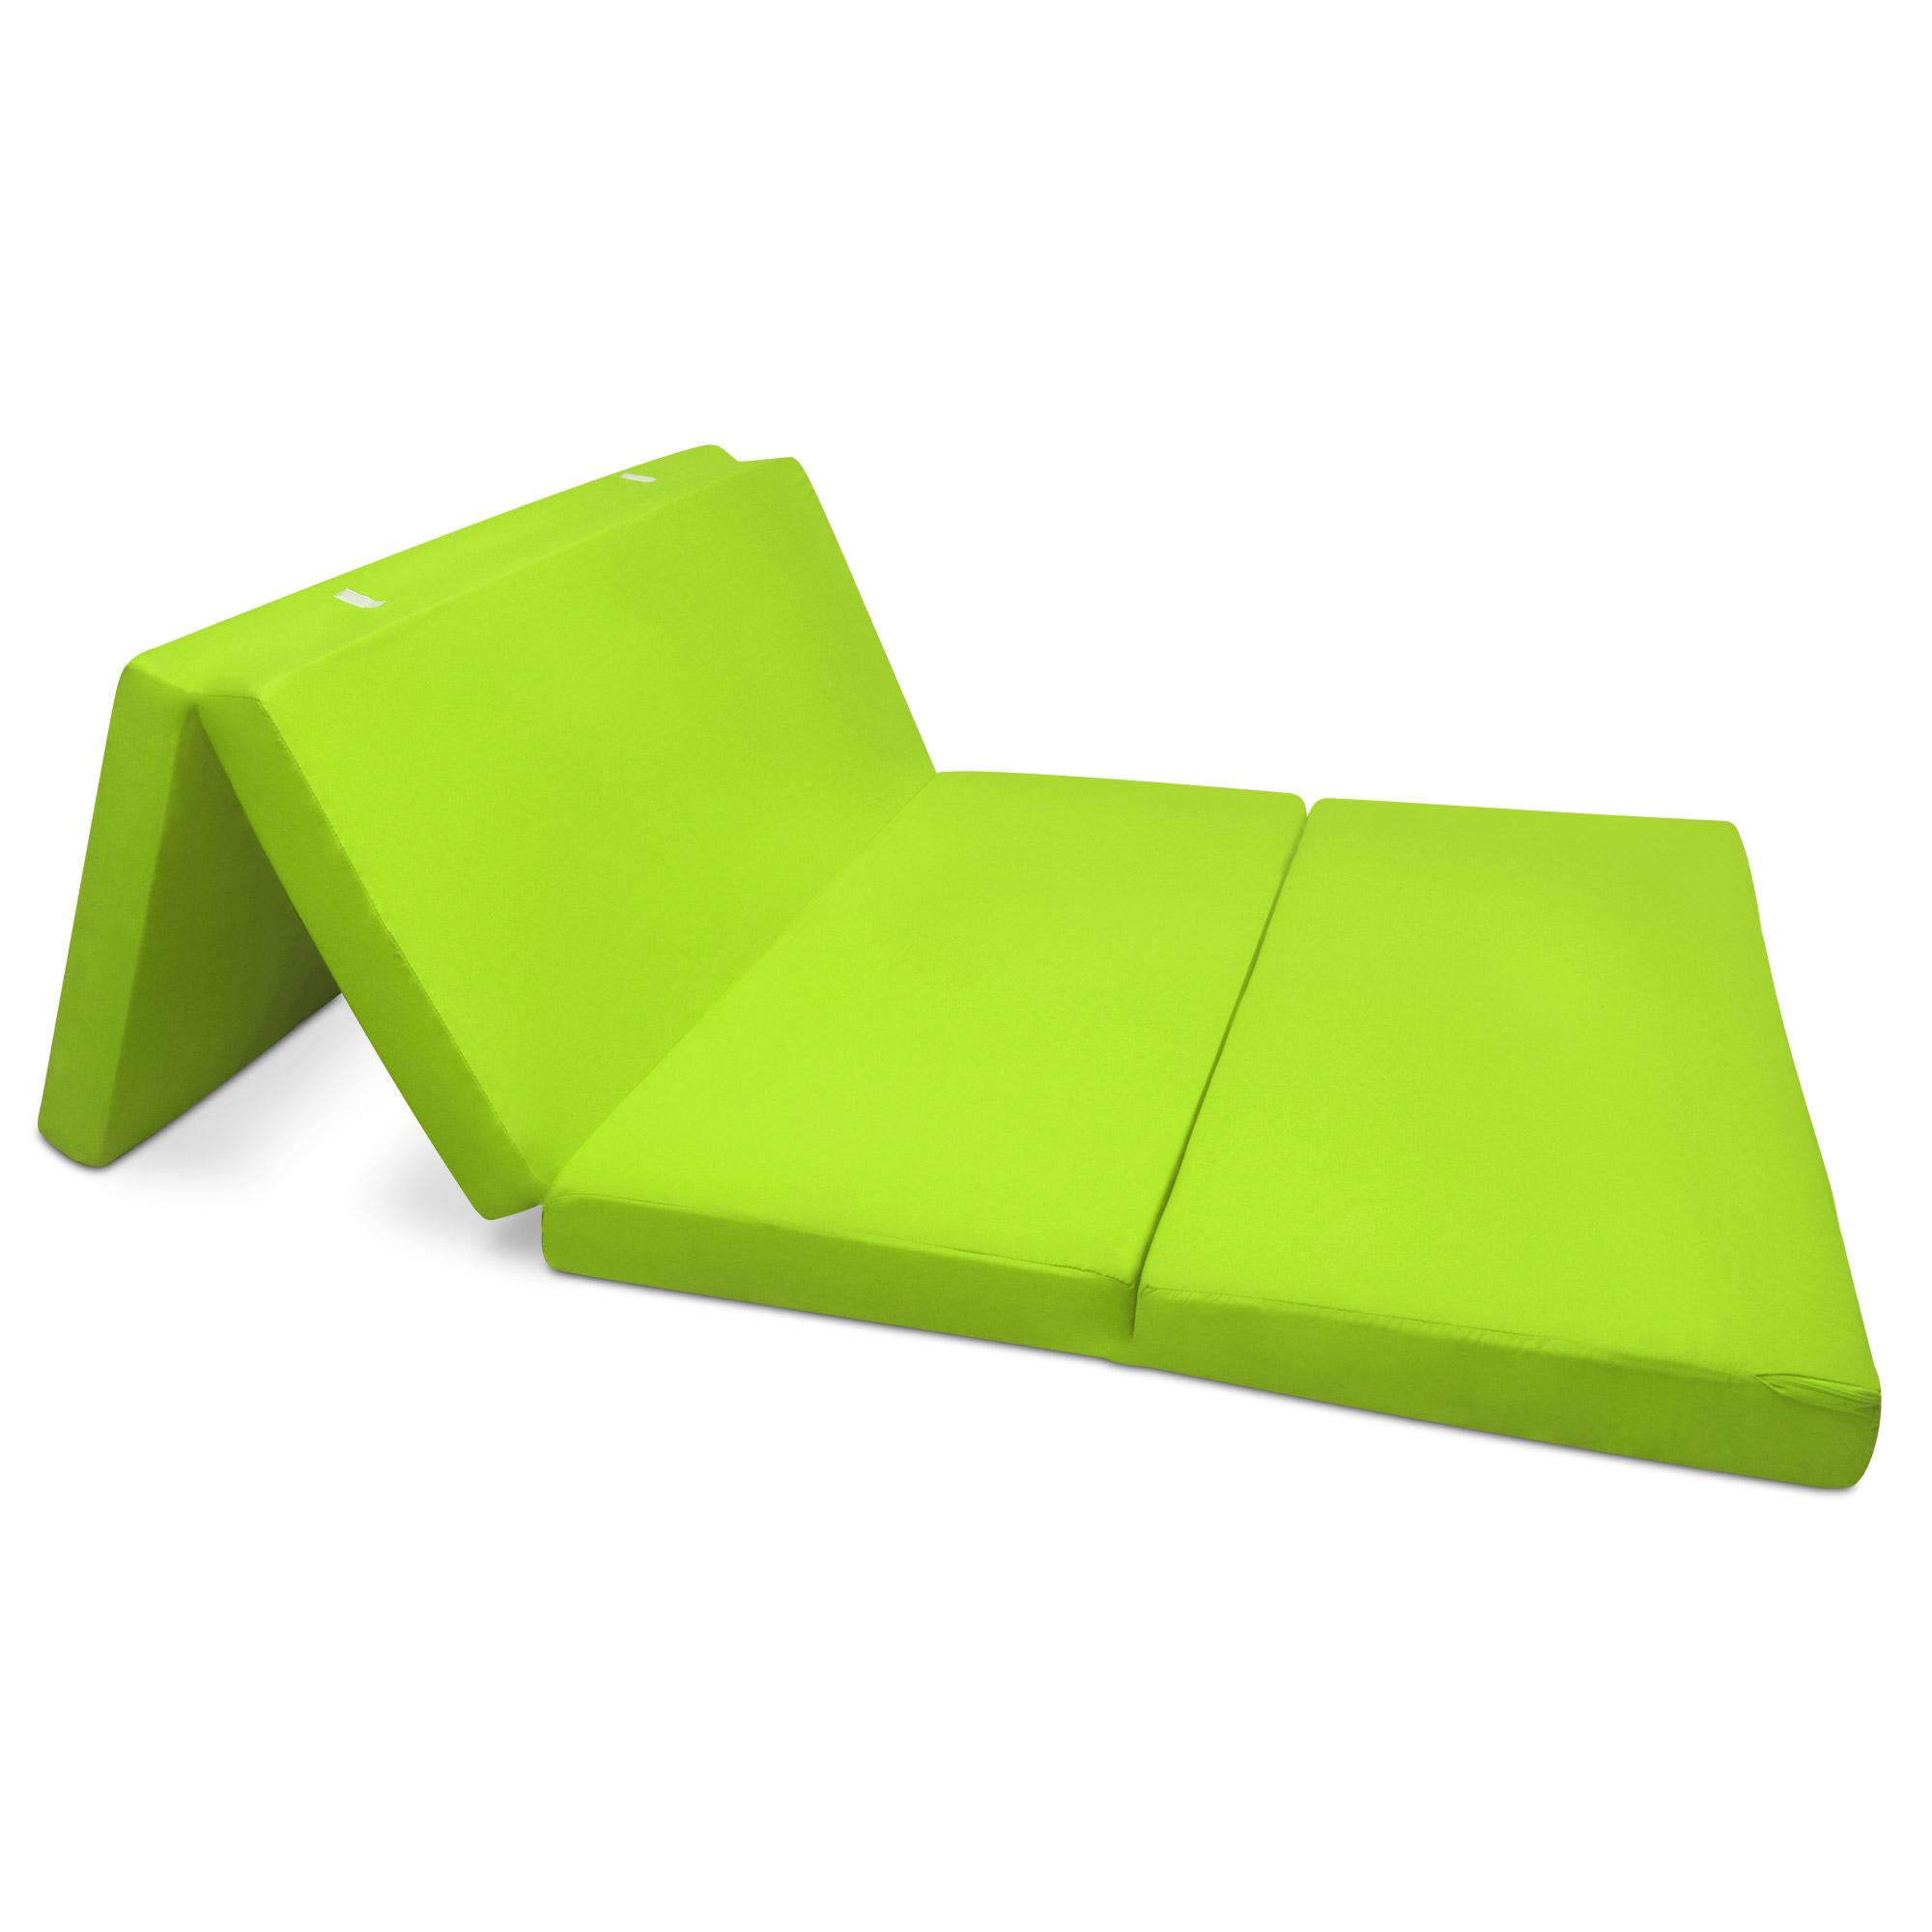 klappmatratze 195x120x7 doppel matratze g stematratze. Black Bedroom Furniture Sets. Home Design Ideas